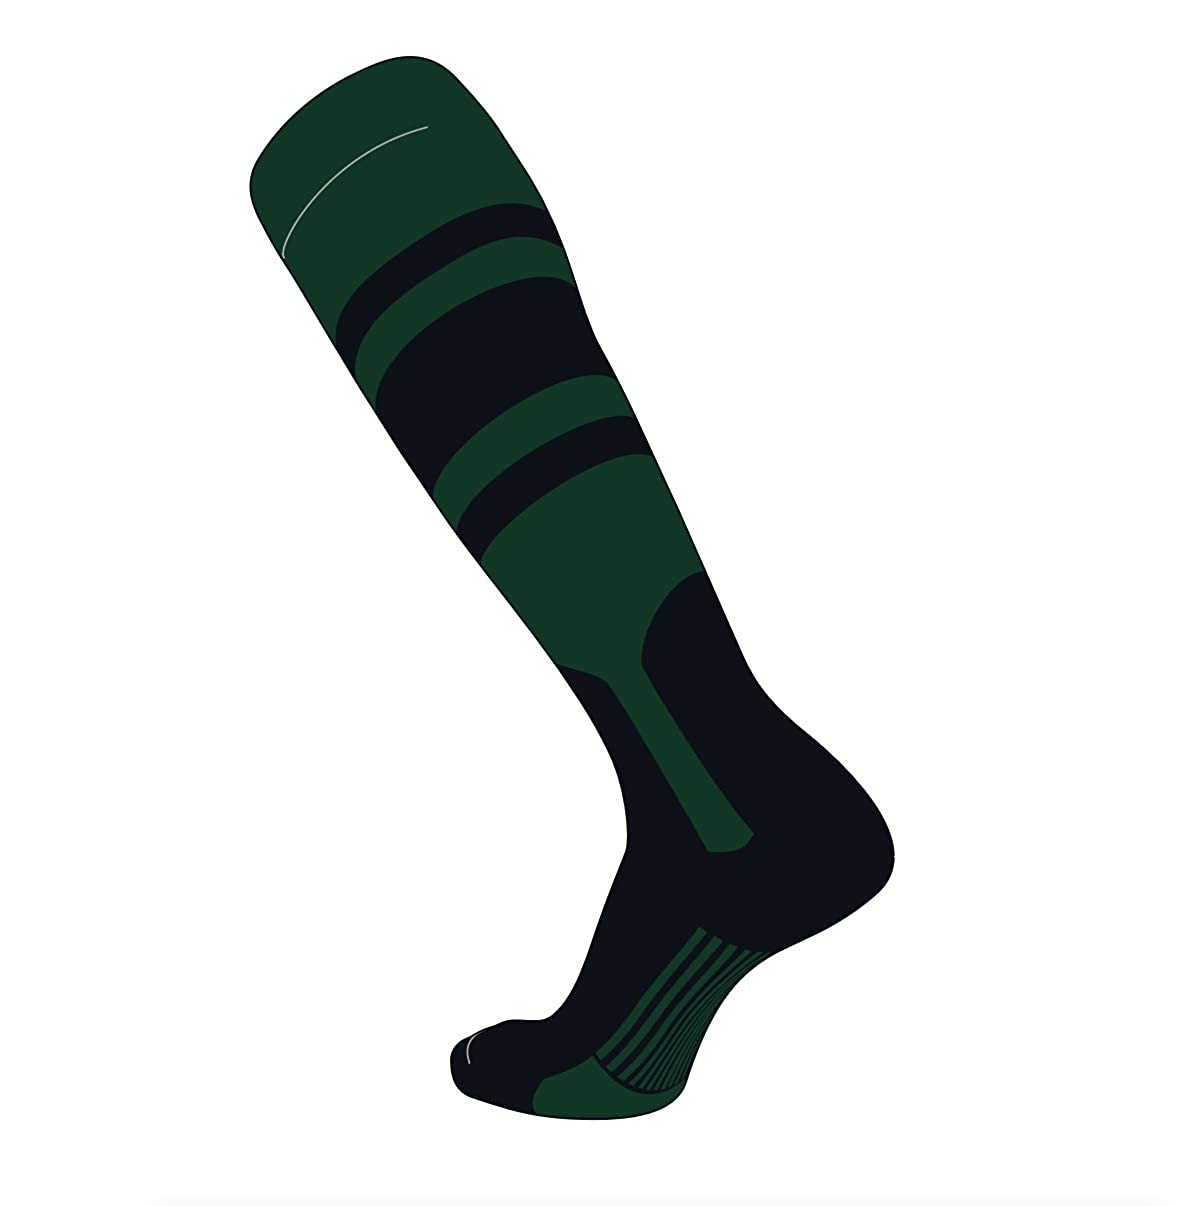 TCK Socks SOCKSHOSIERY メンズ Large Socks SOCKSHOSIERY TCK B07QB4GK2G, シチノヘマチ:de005662 --- cgt-tbc.fr